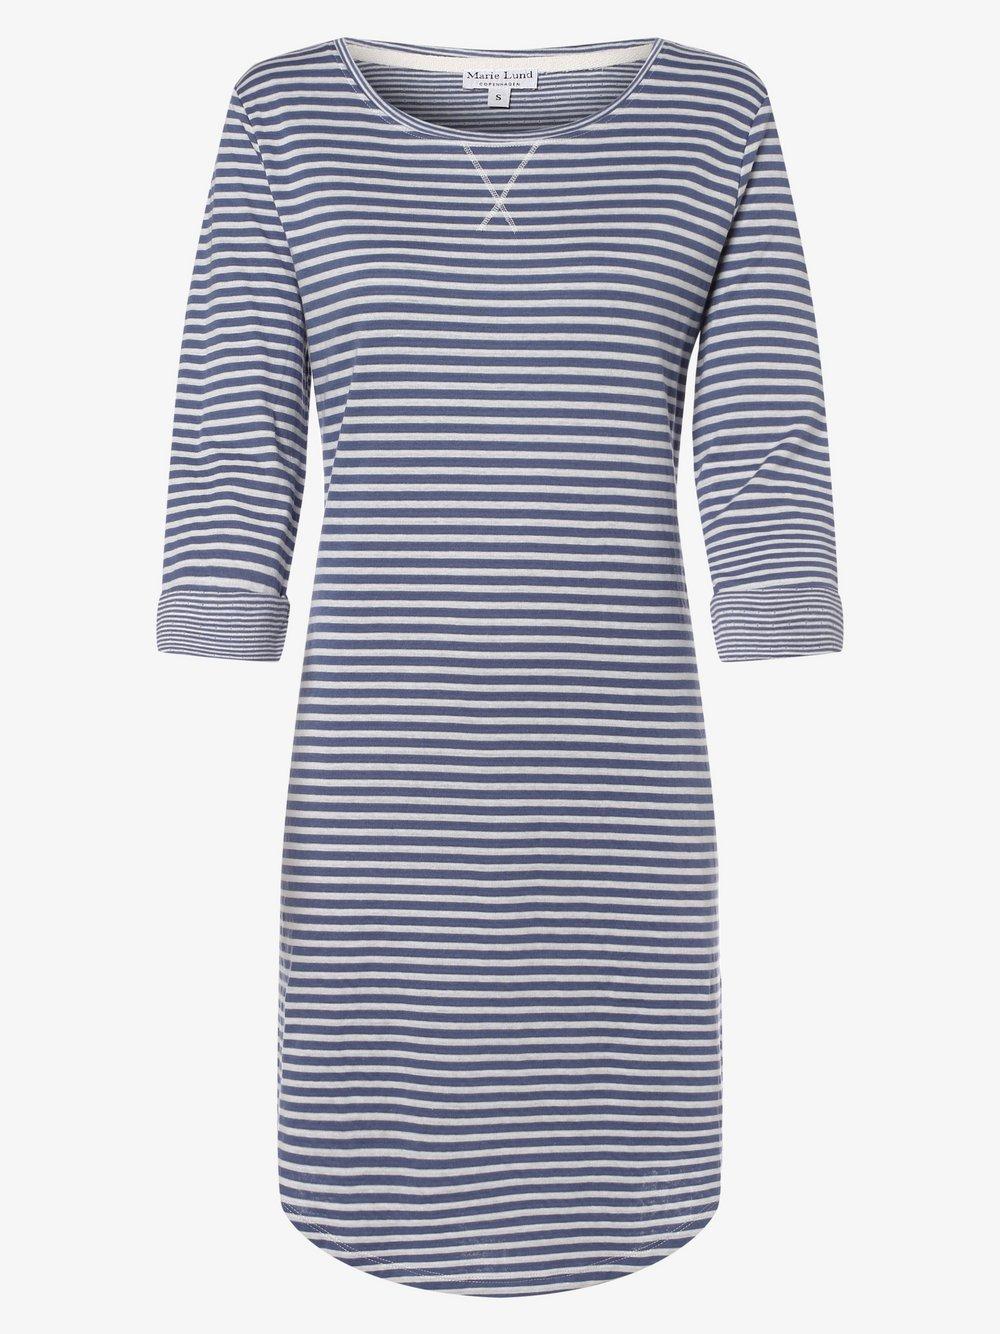 Marie Lund - Damska koszula nocna, niebieski